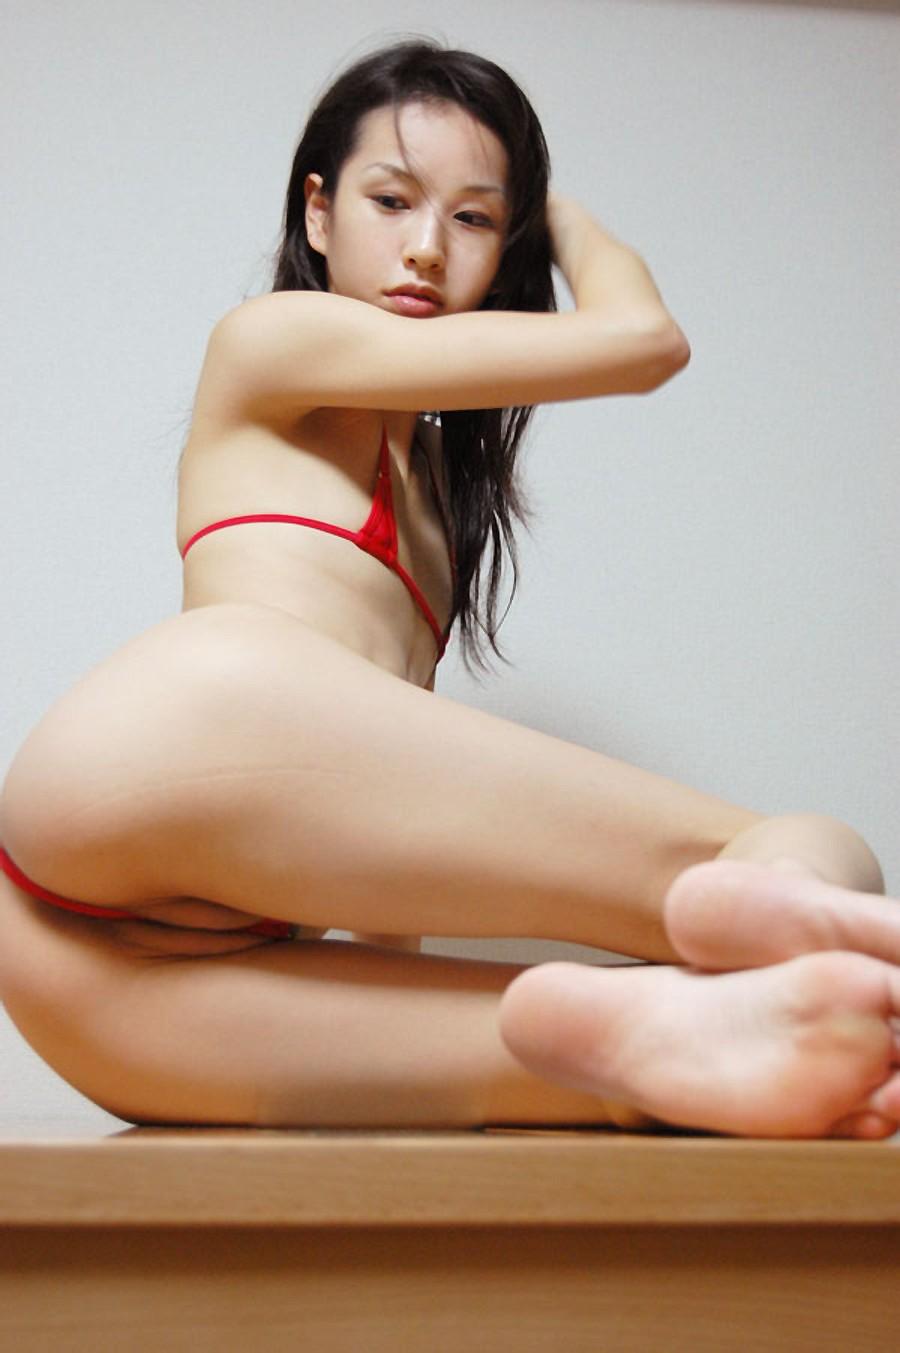 Straight girls licking tits